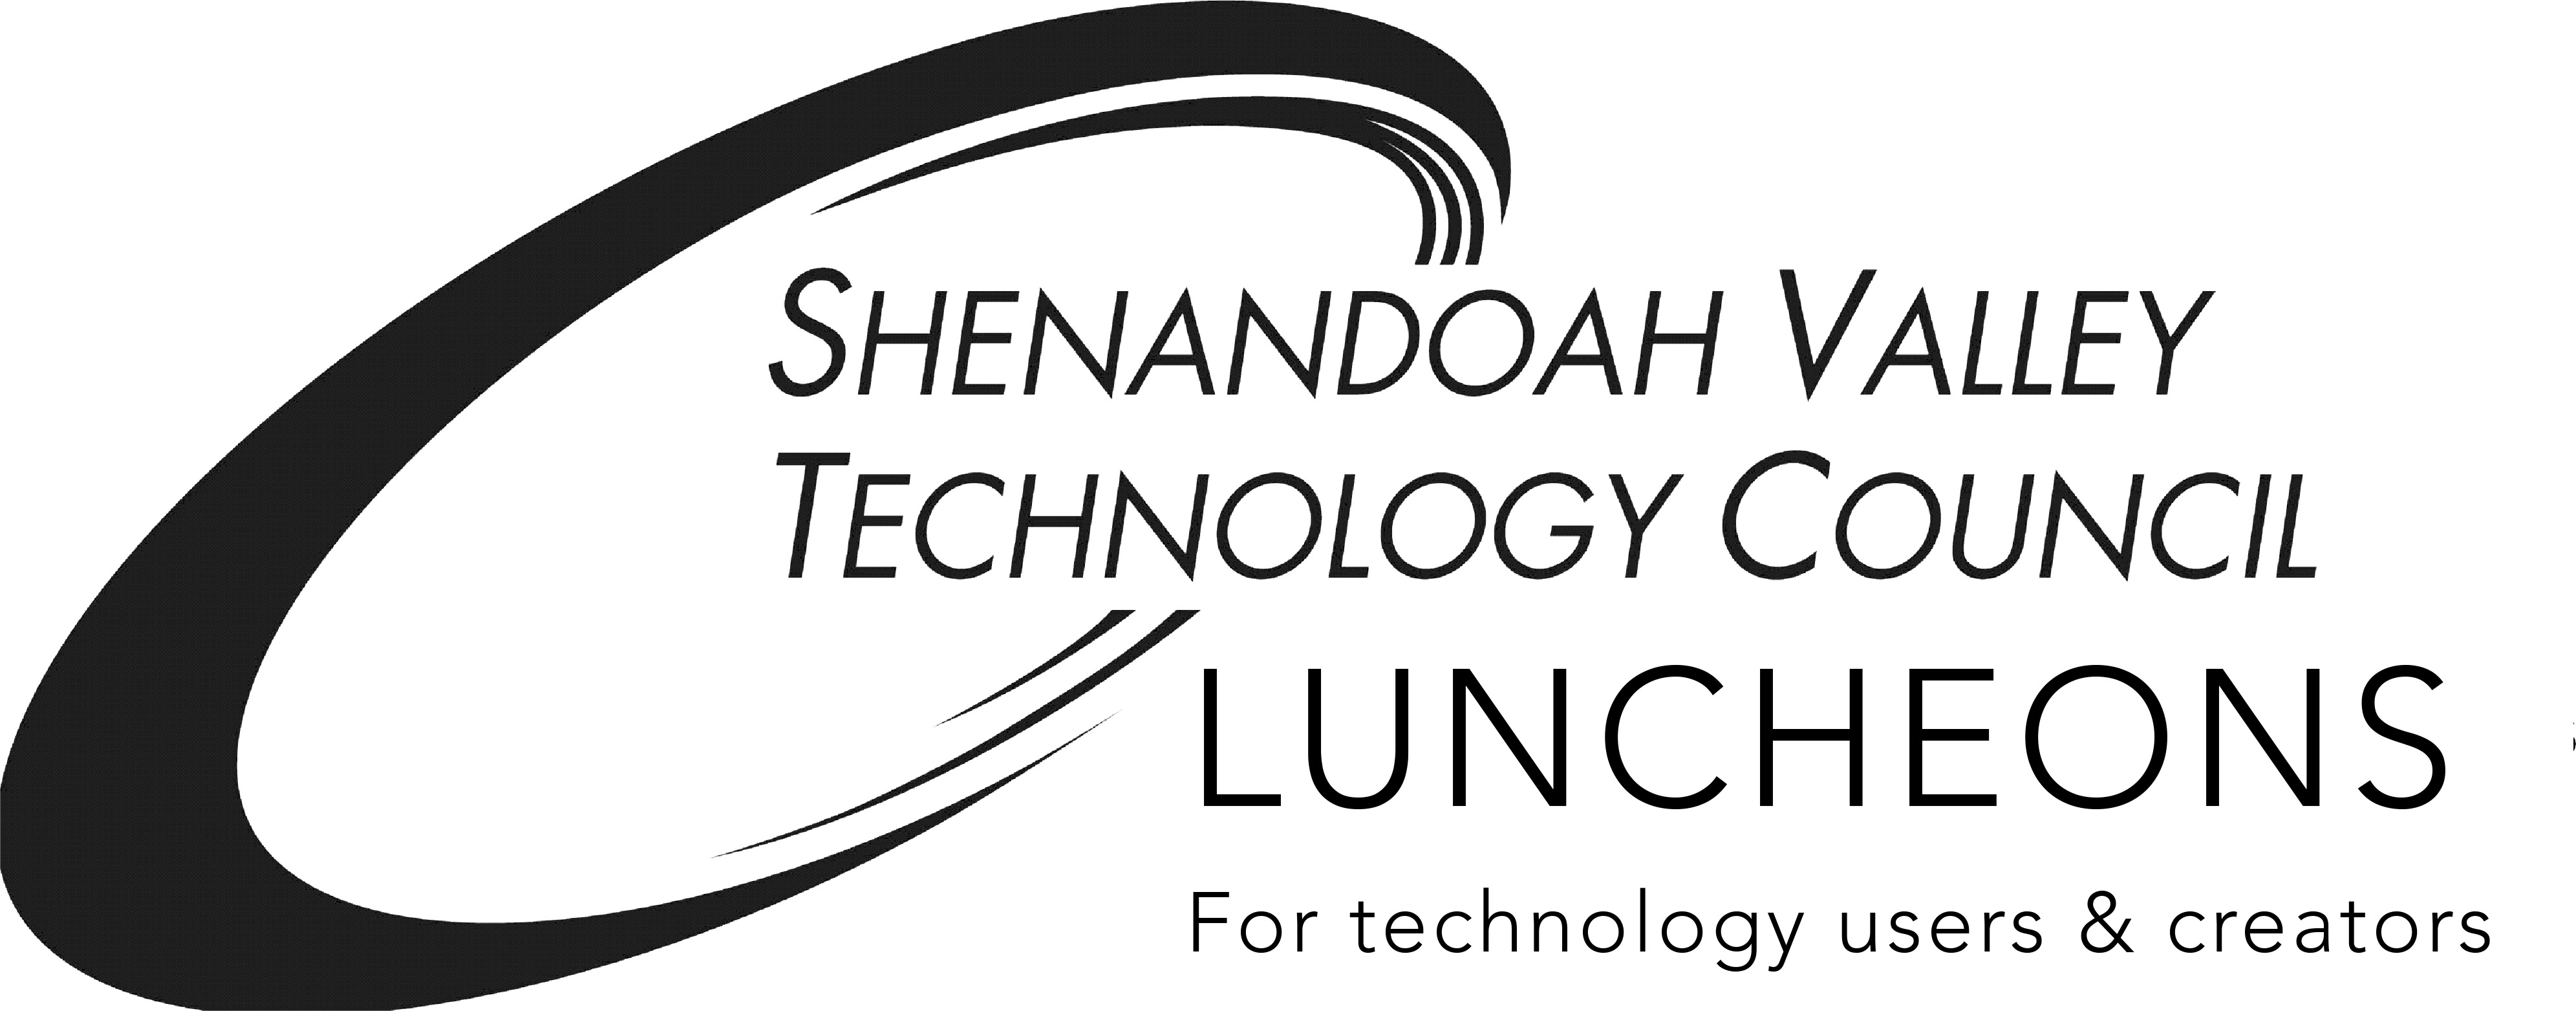 SVTC Luncheons Logo